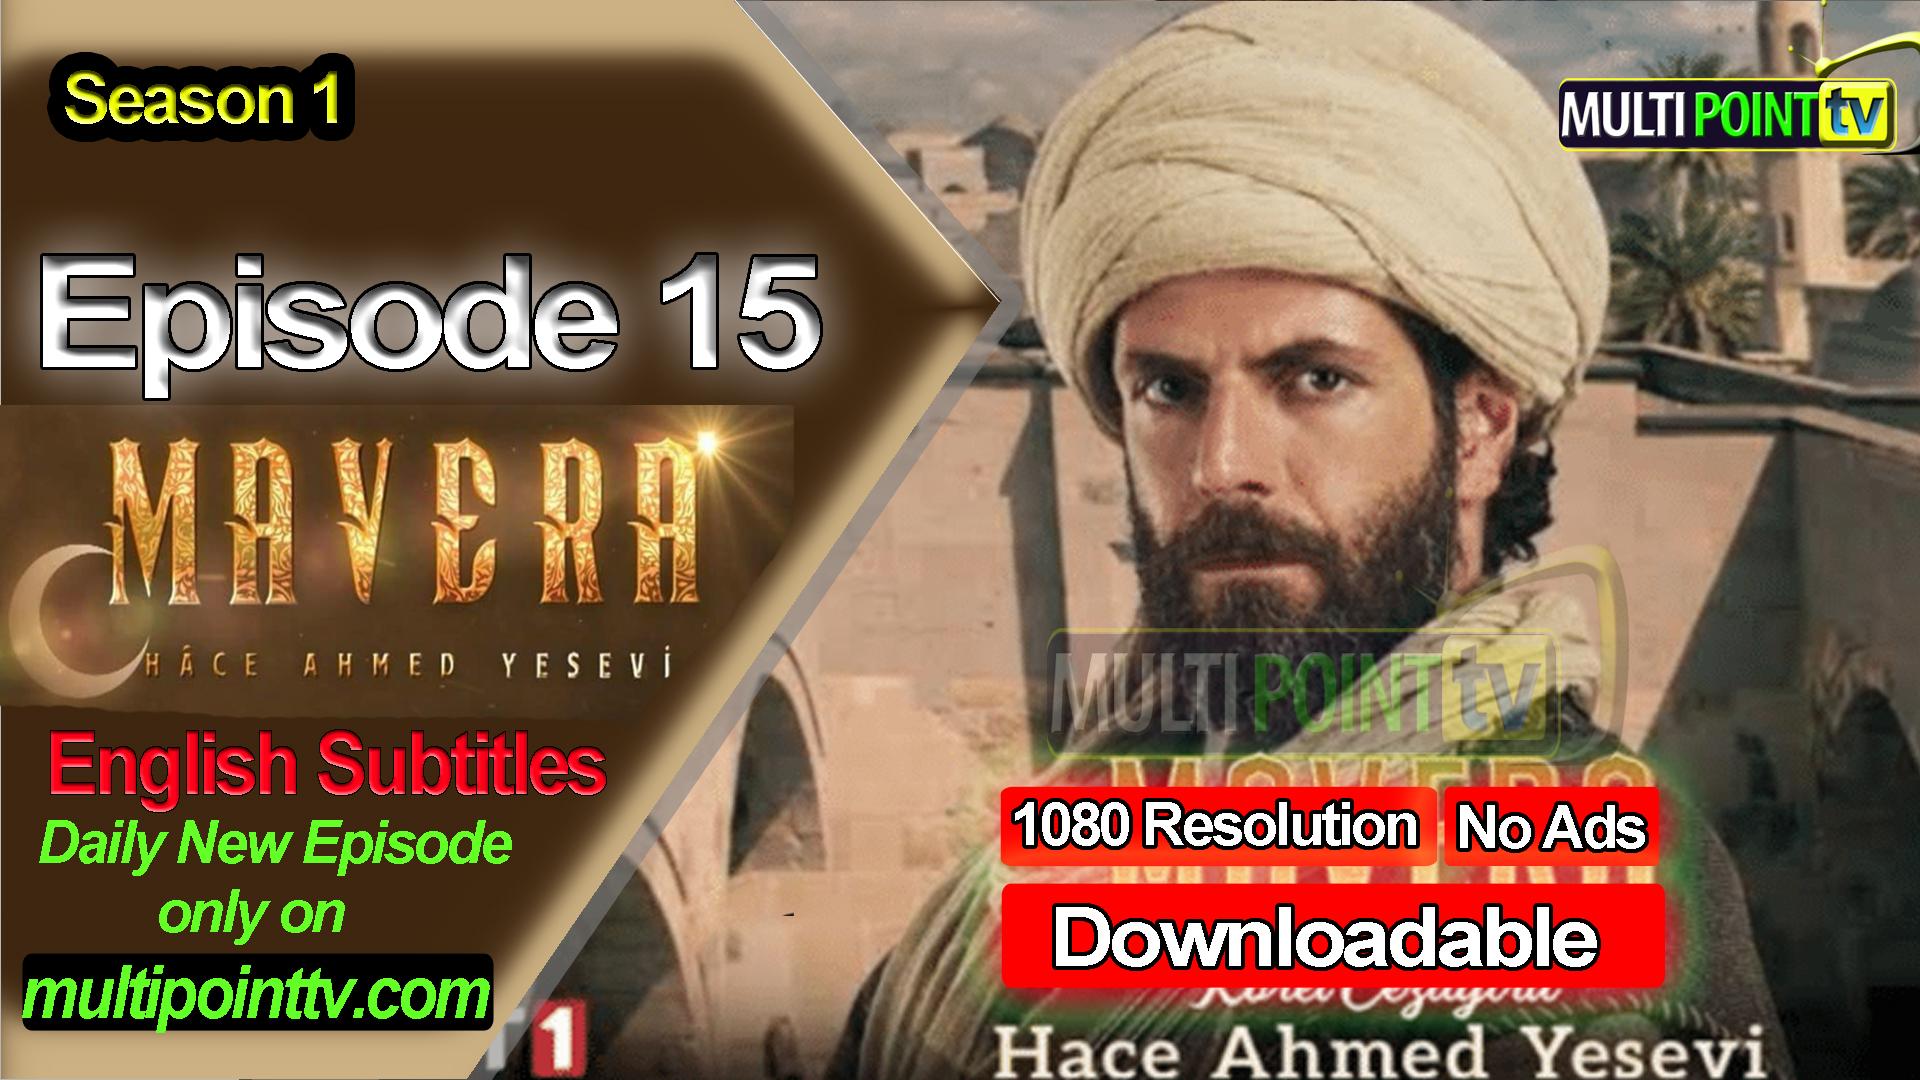 Mavera Episode 15 English Subtitles